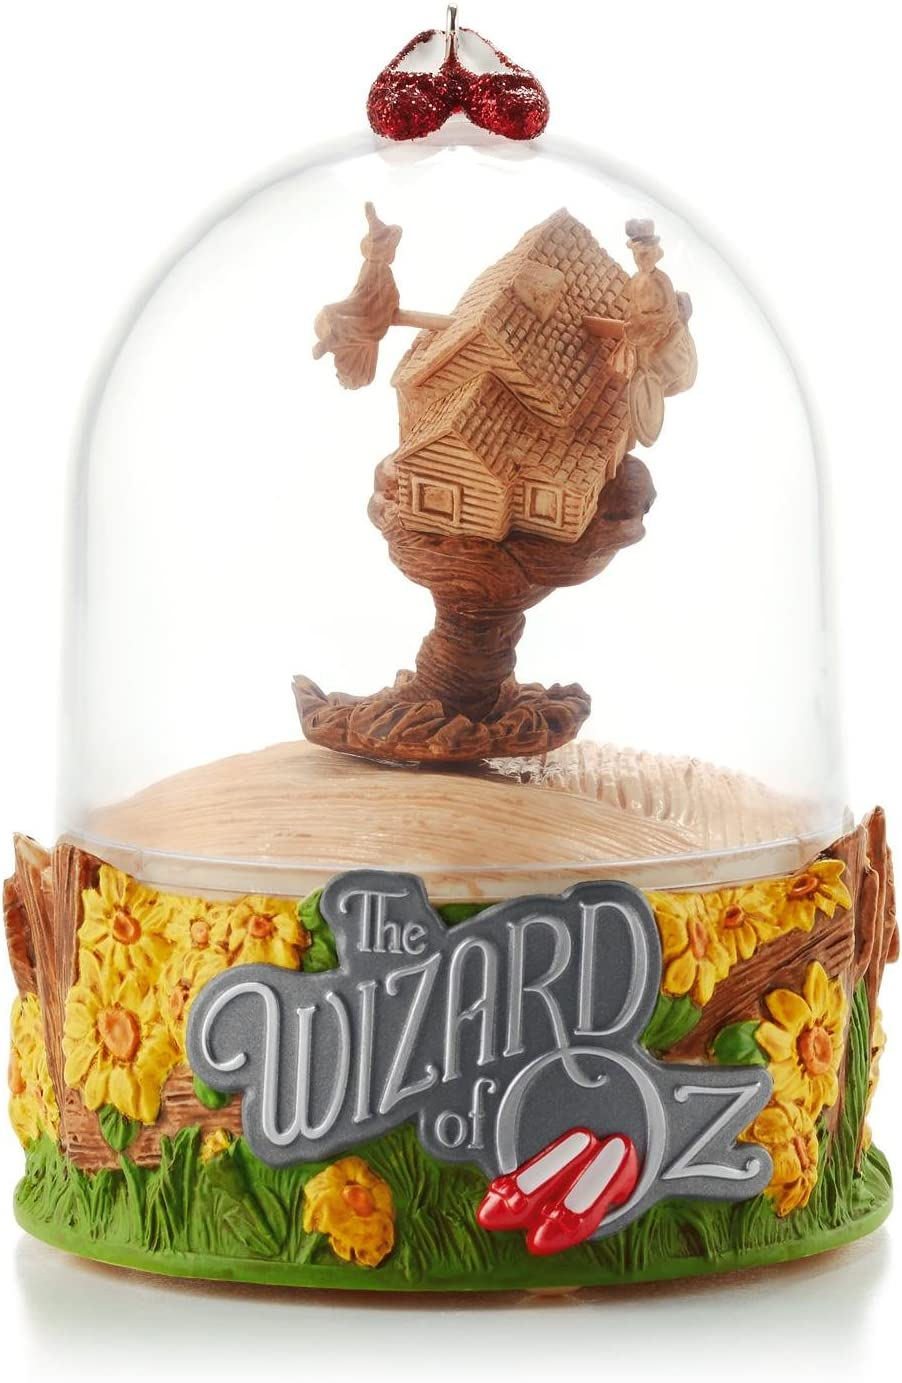 Hallmark It's A Twister - The Wizard of Oz 2013 Ornament